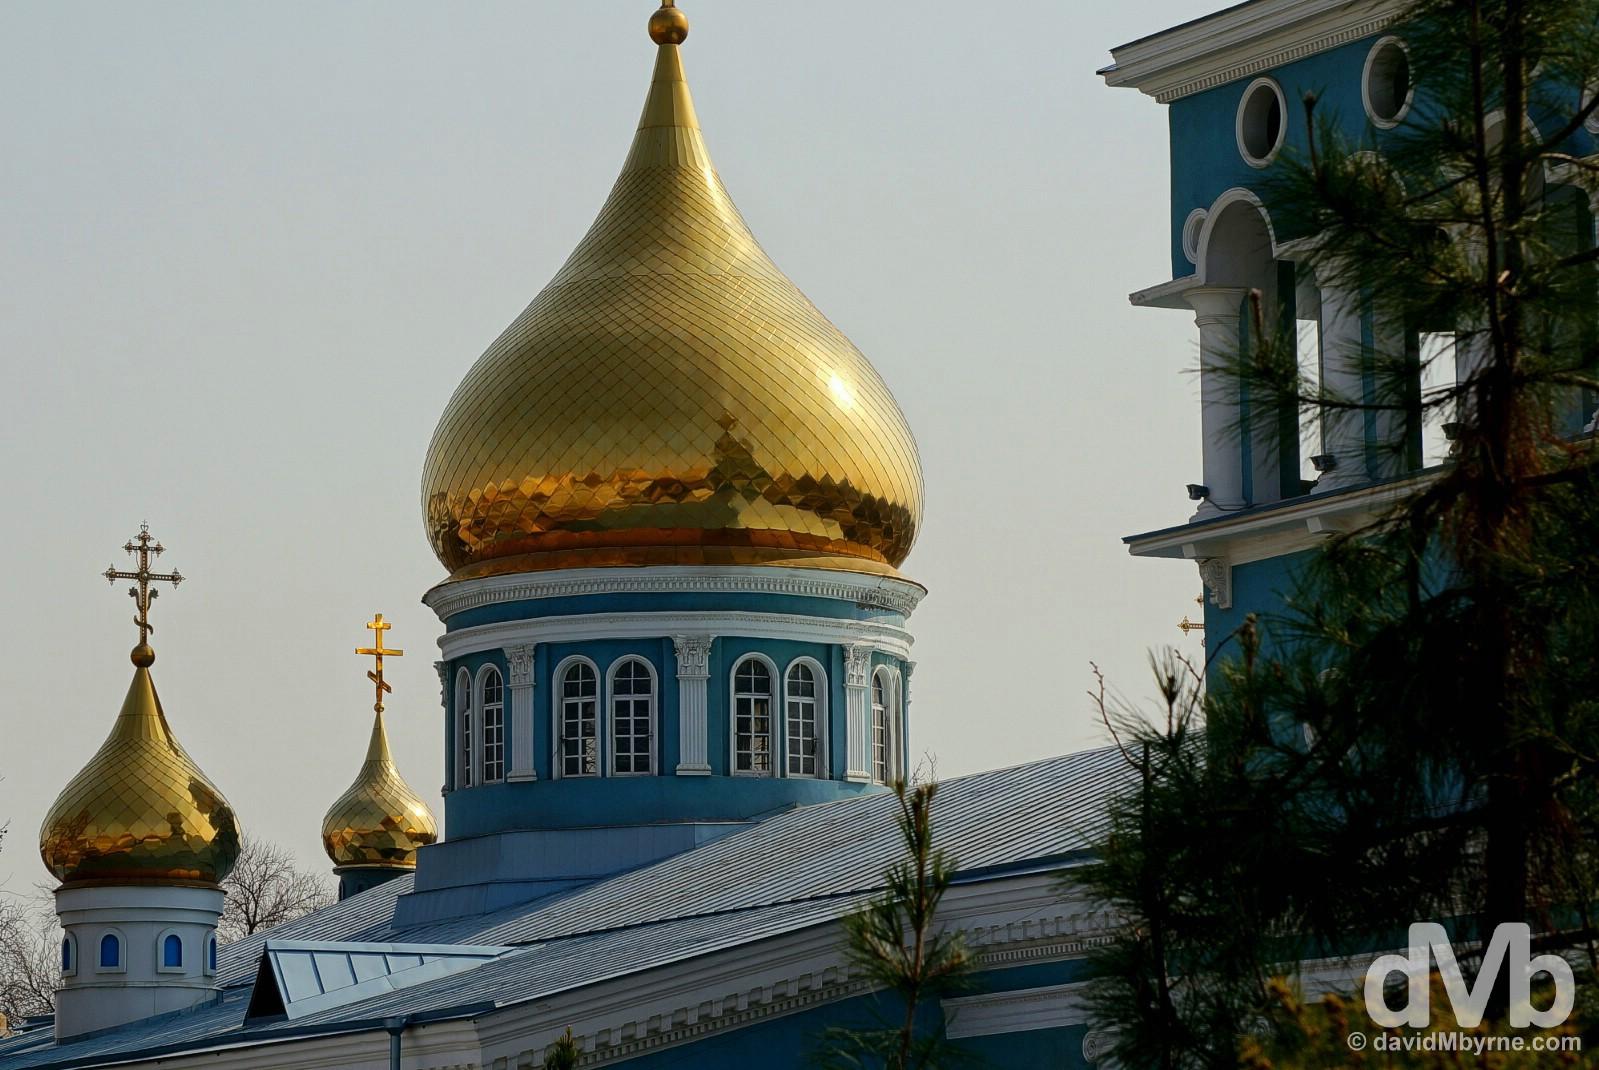 Assumption Cathedral in Tashkent, Uzbekistan. March 5, 2015.